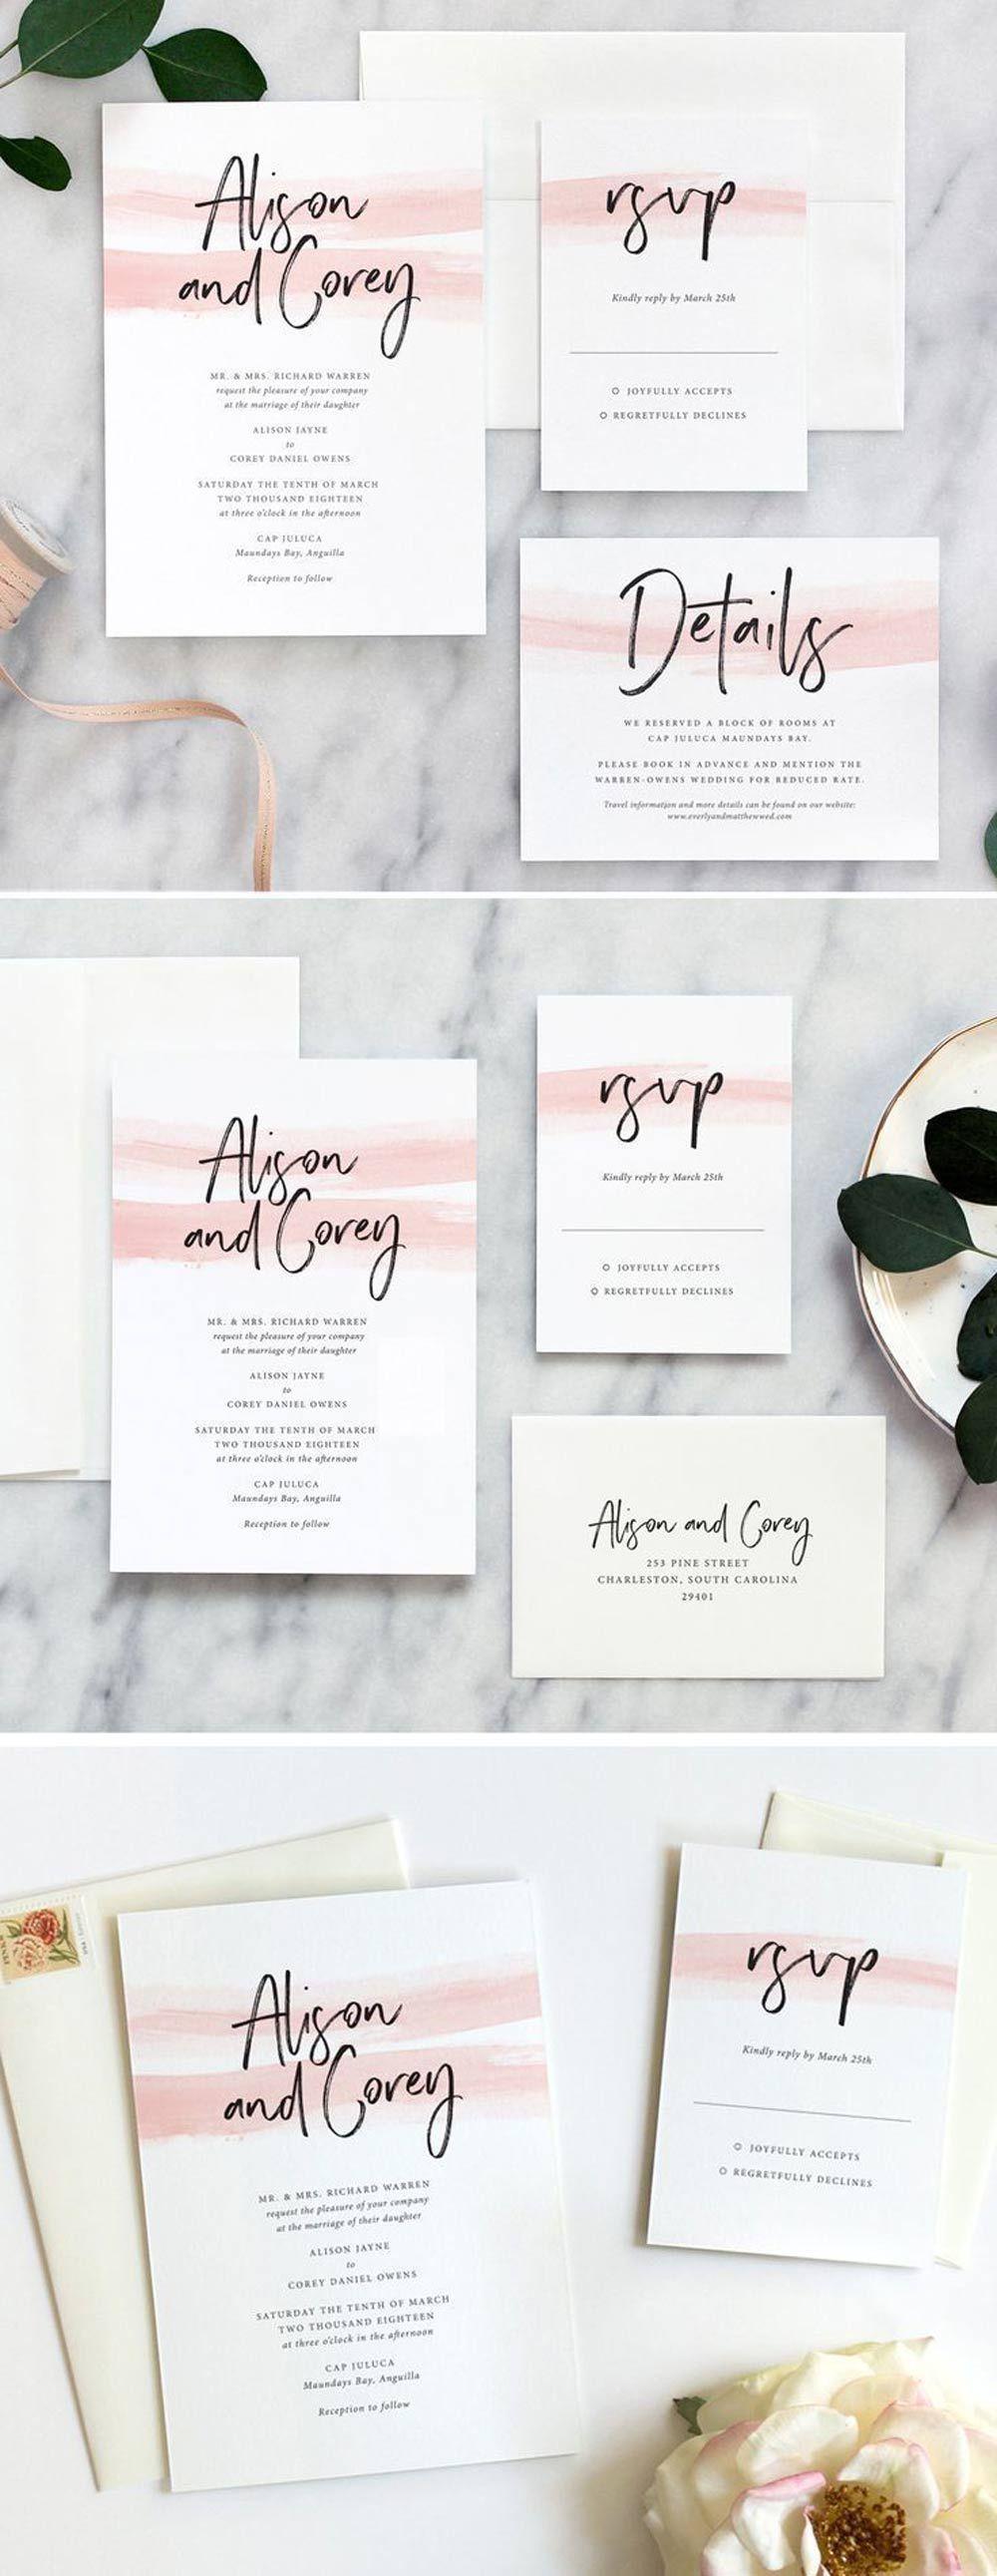 Diy Watercolour Wedding Invitations Instructions